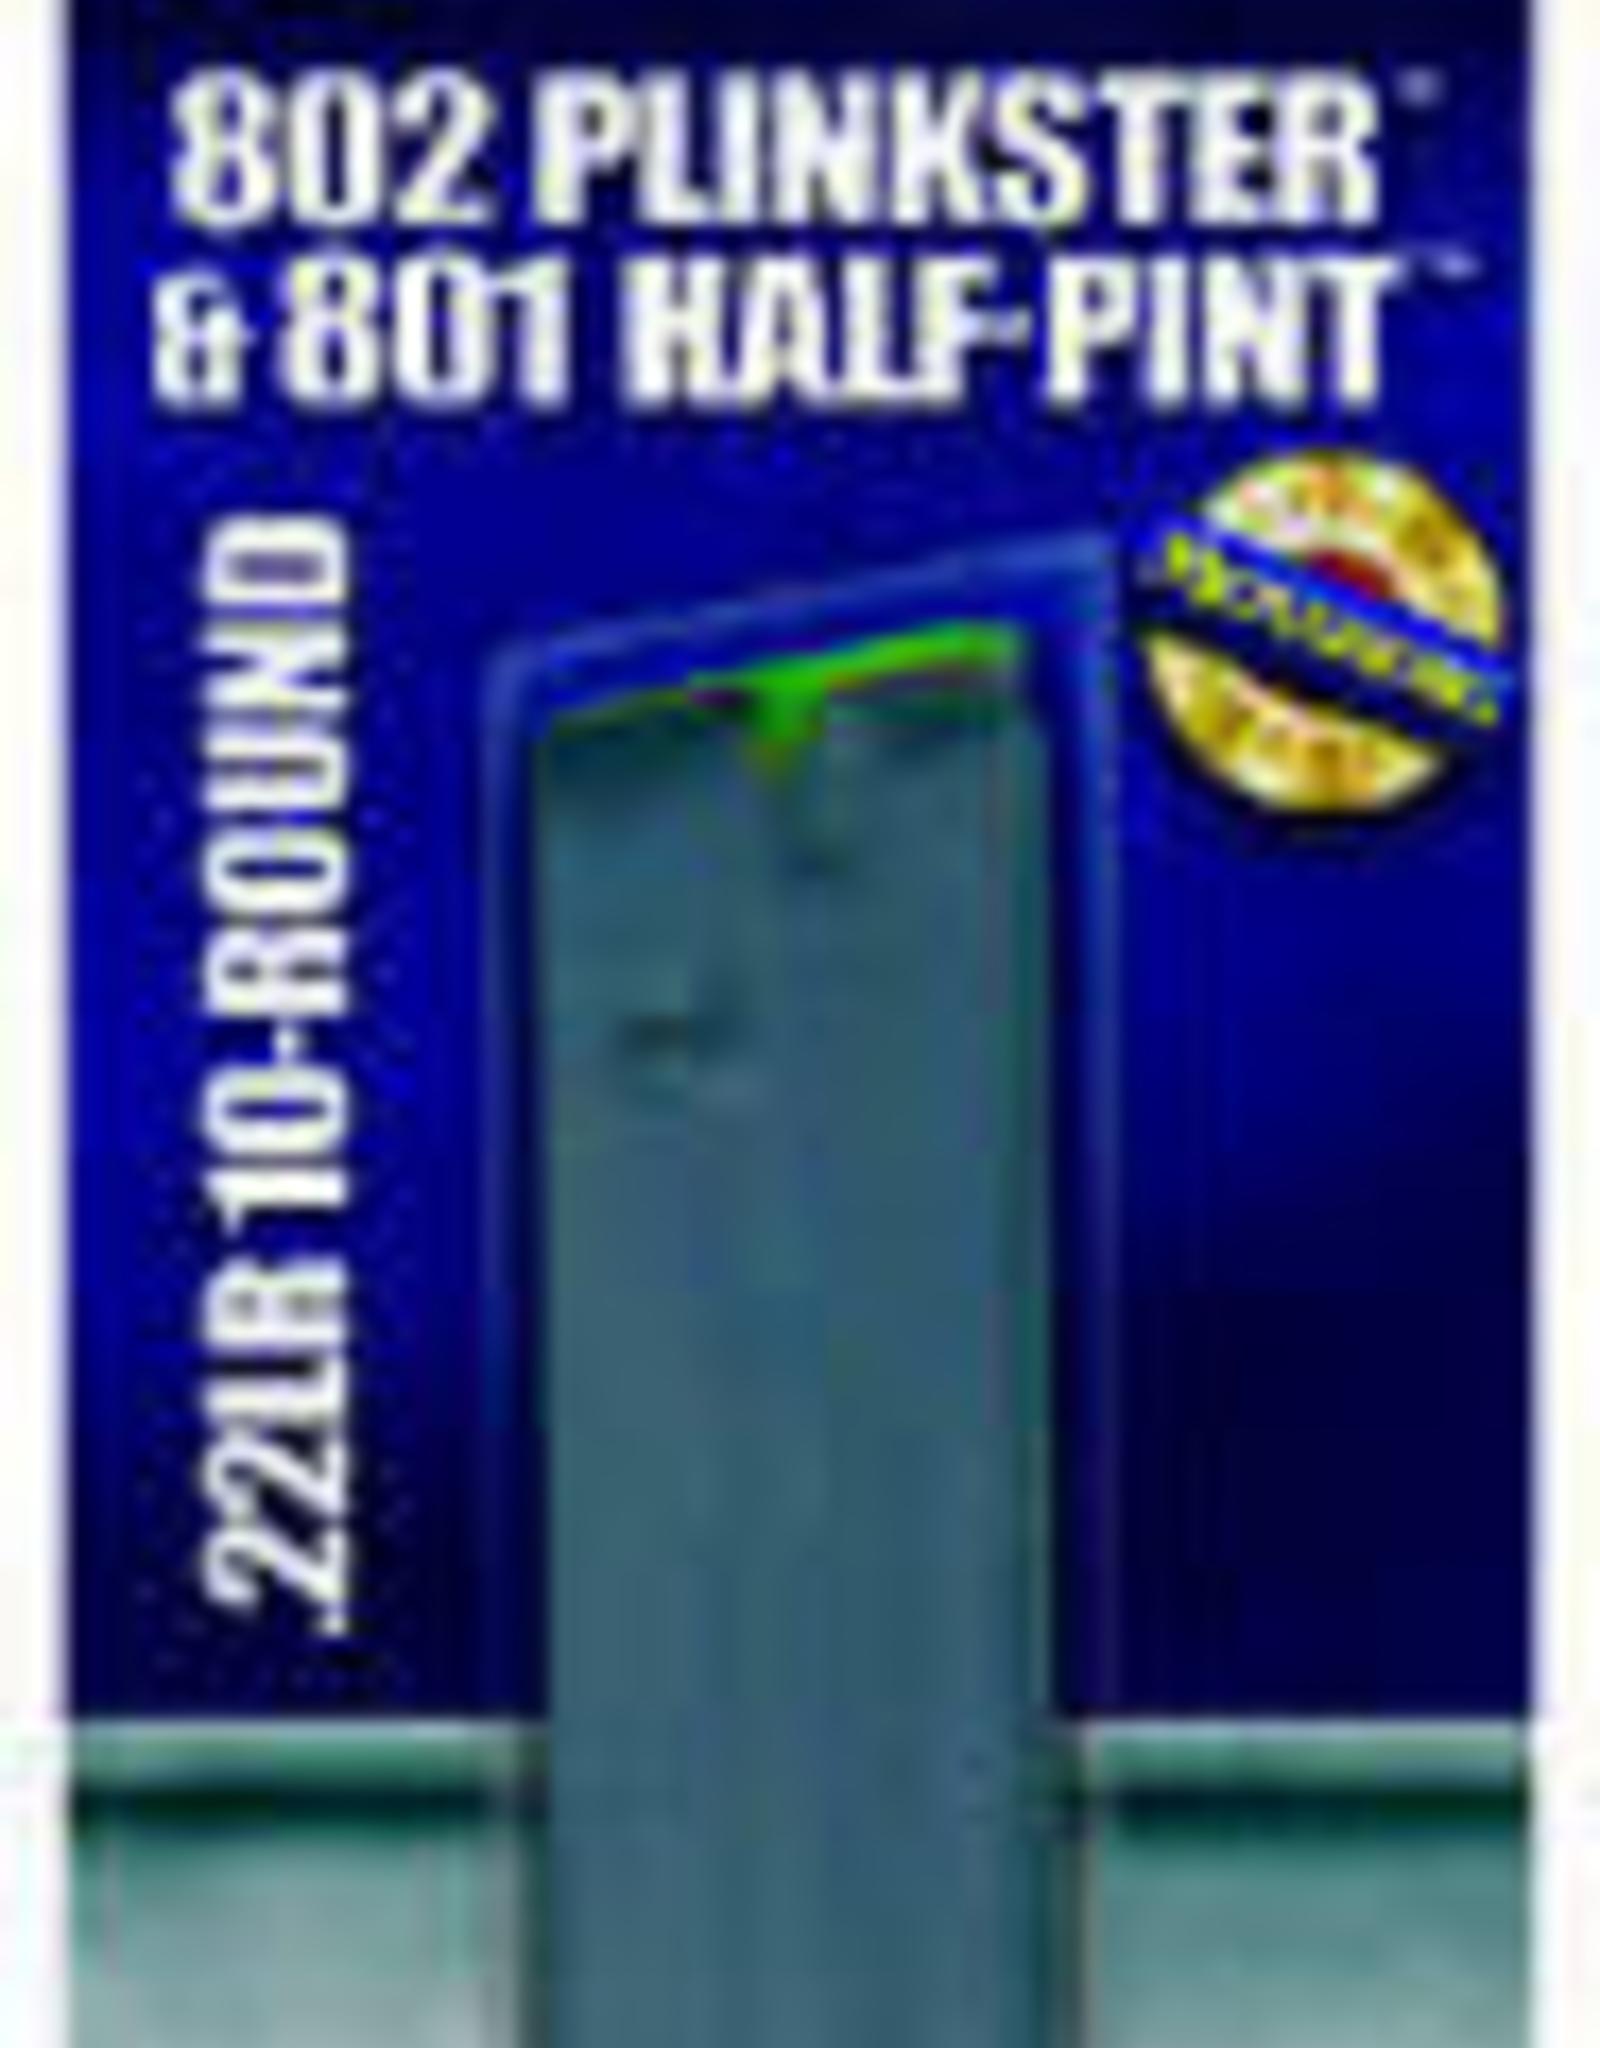 Mossberg 802 Plinkster & 801 Half-Pint Magazine